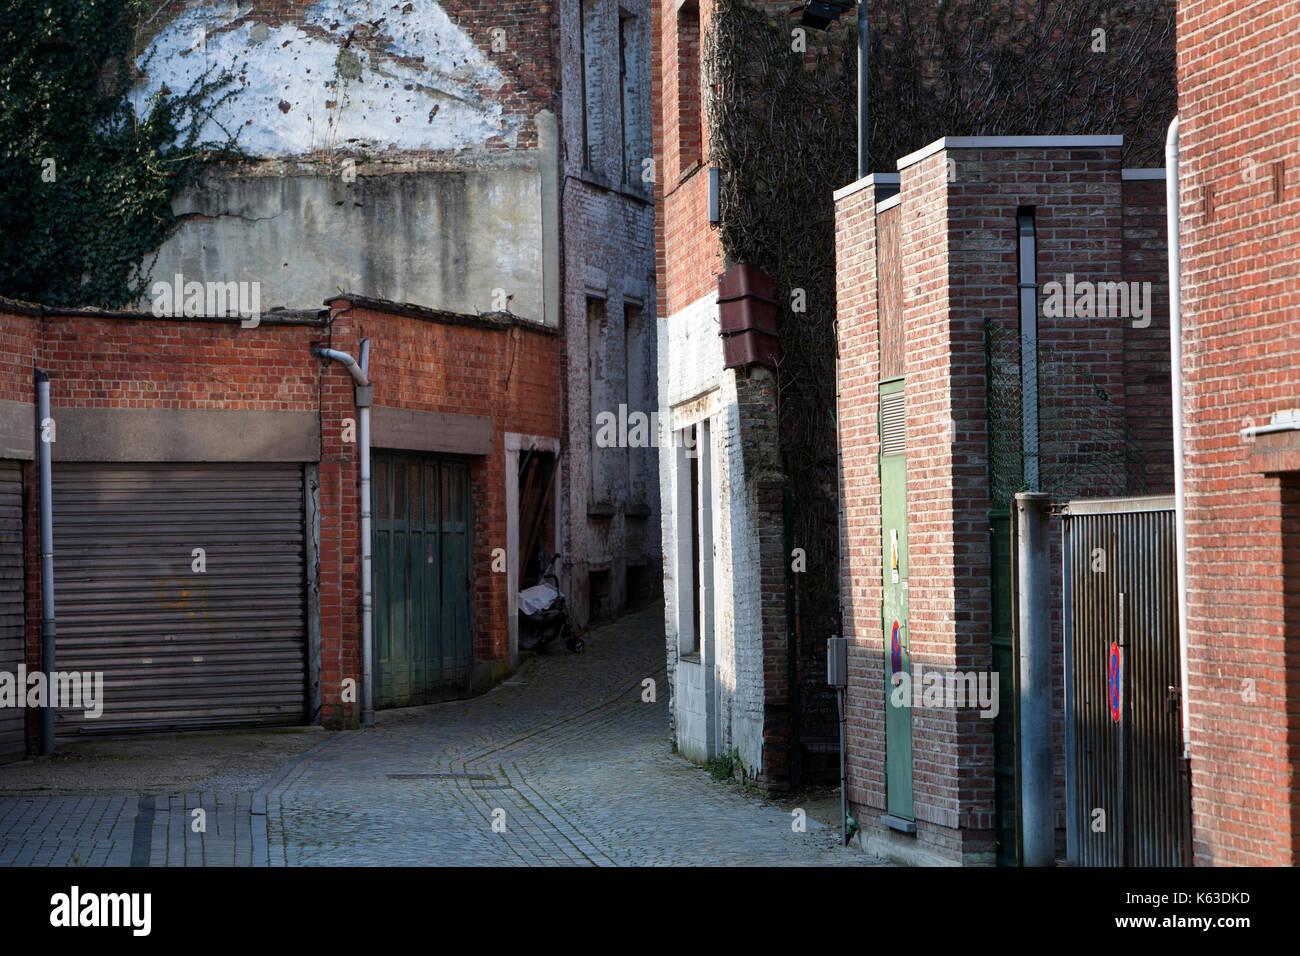 Fiat Garage Mechelen : Small parking garage stock photos & small parking garage stock